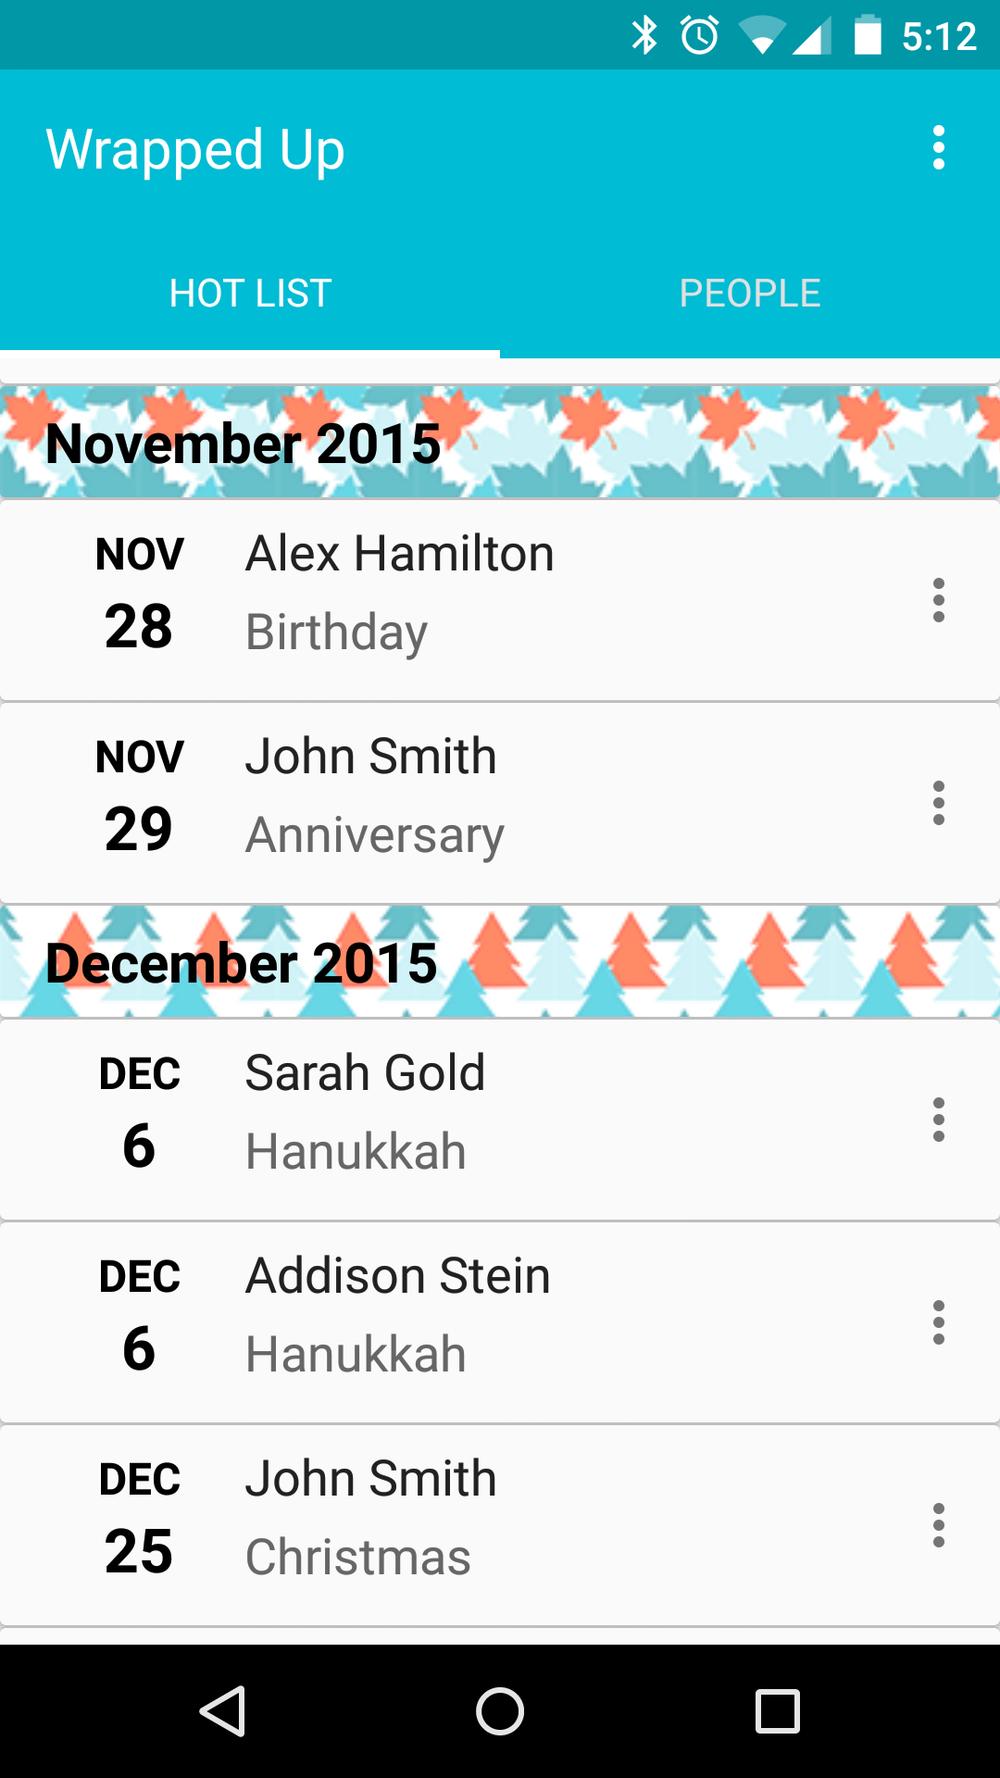 Wrapped Up Hot List Screenshot